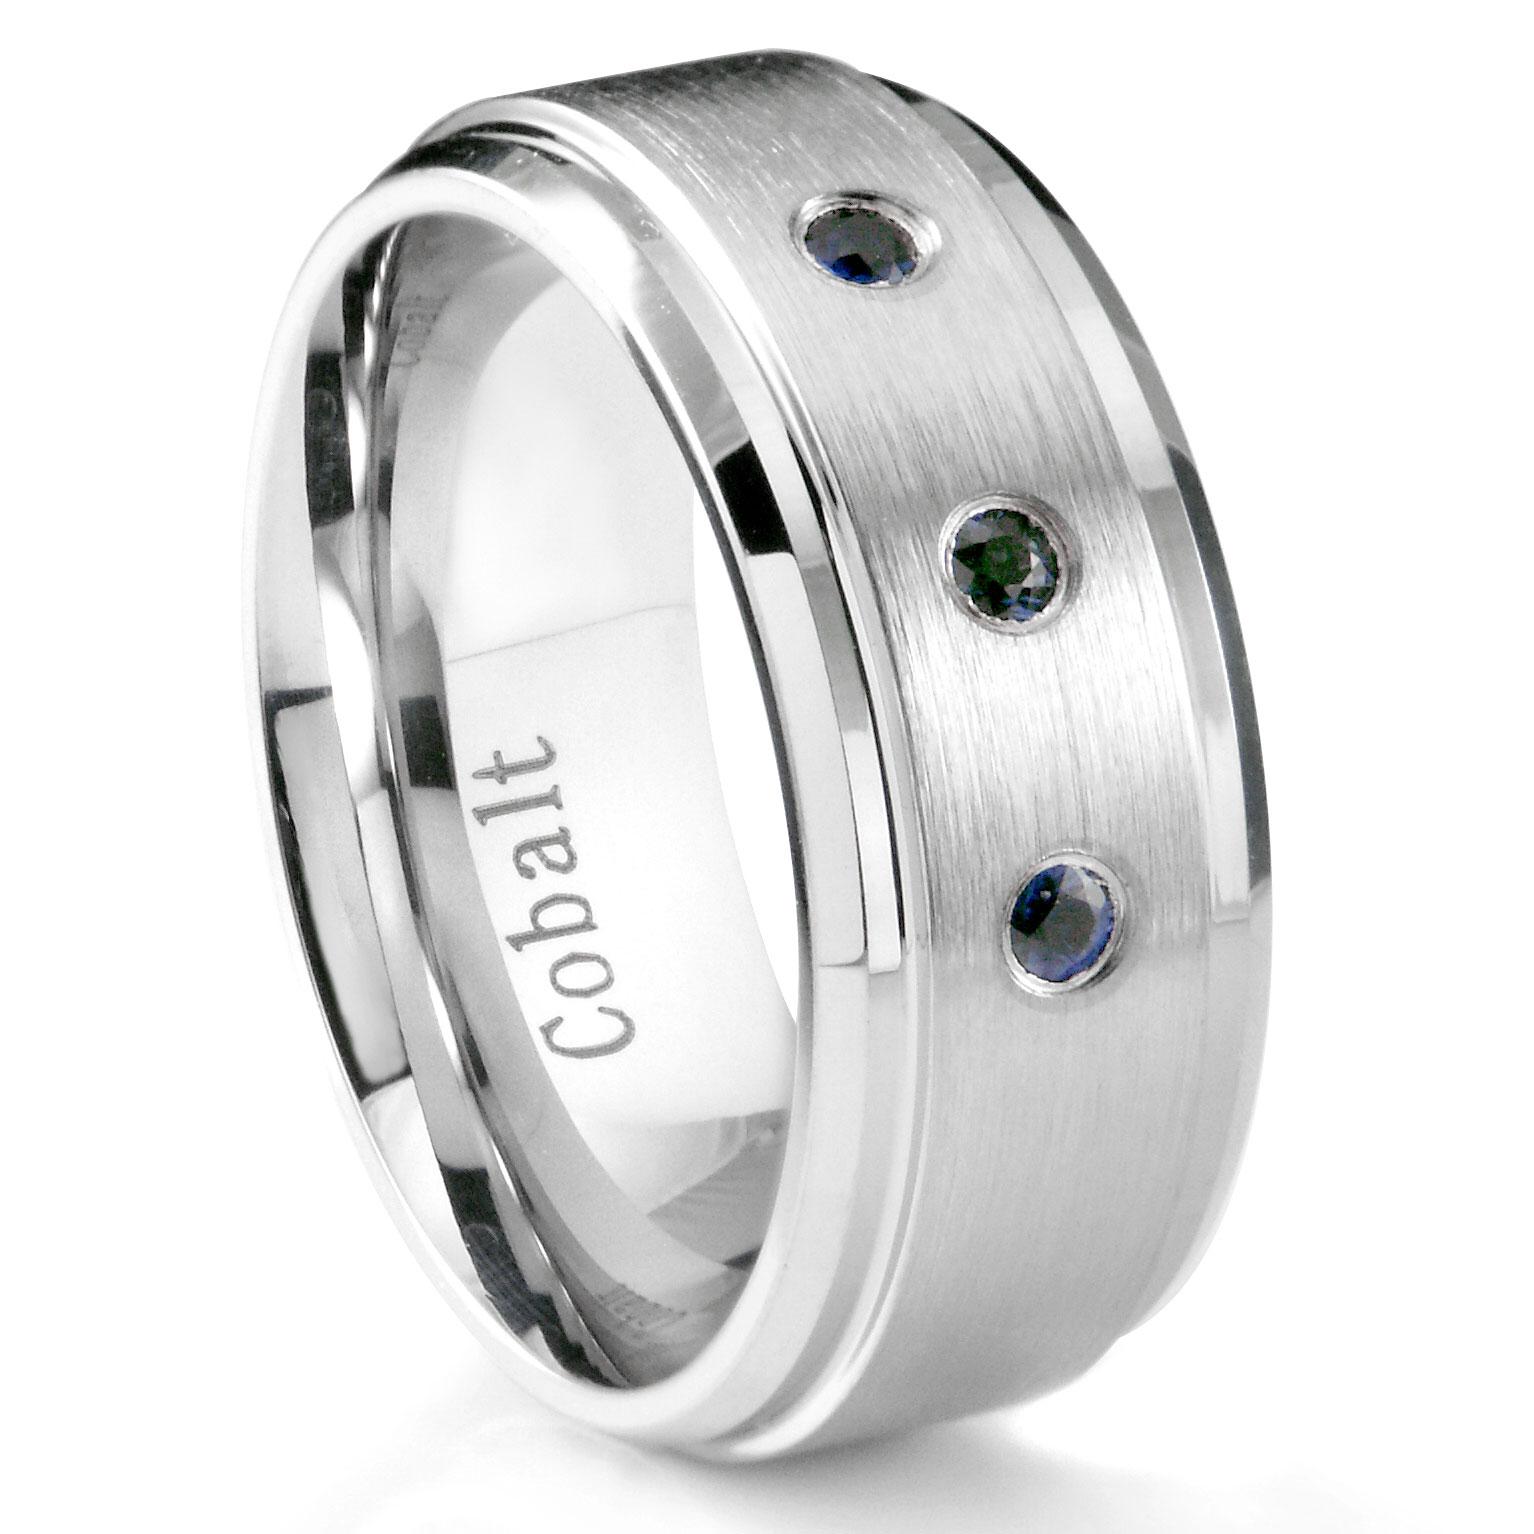 Cobalt Chrome 8MM 3 Blue Sapphire Wedding Band Ring w Stepped Edges P cobalt wedding rings Home Cobalt Rings Loading zoom